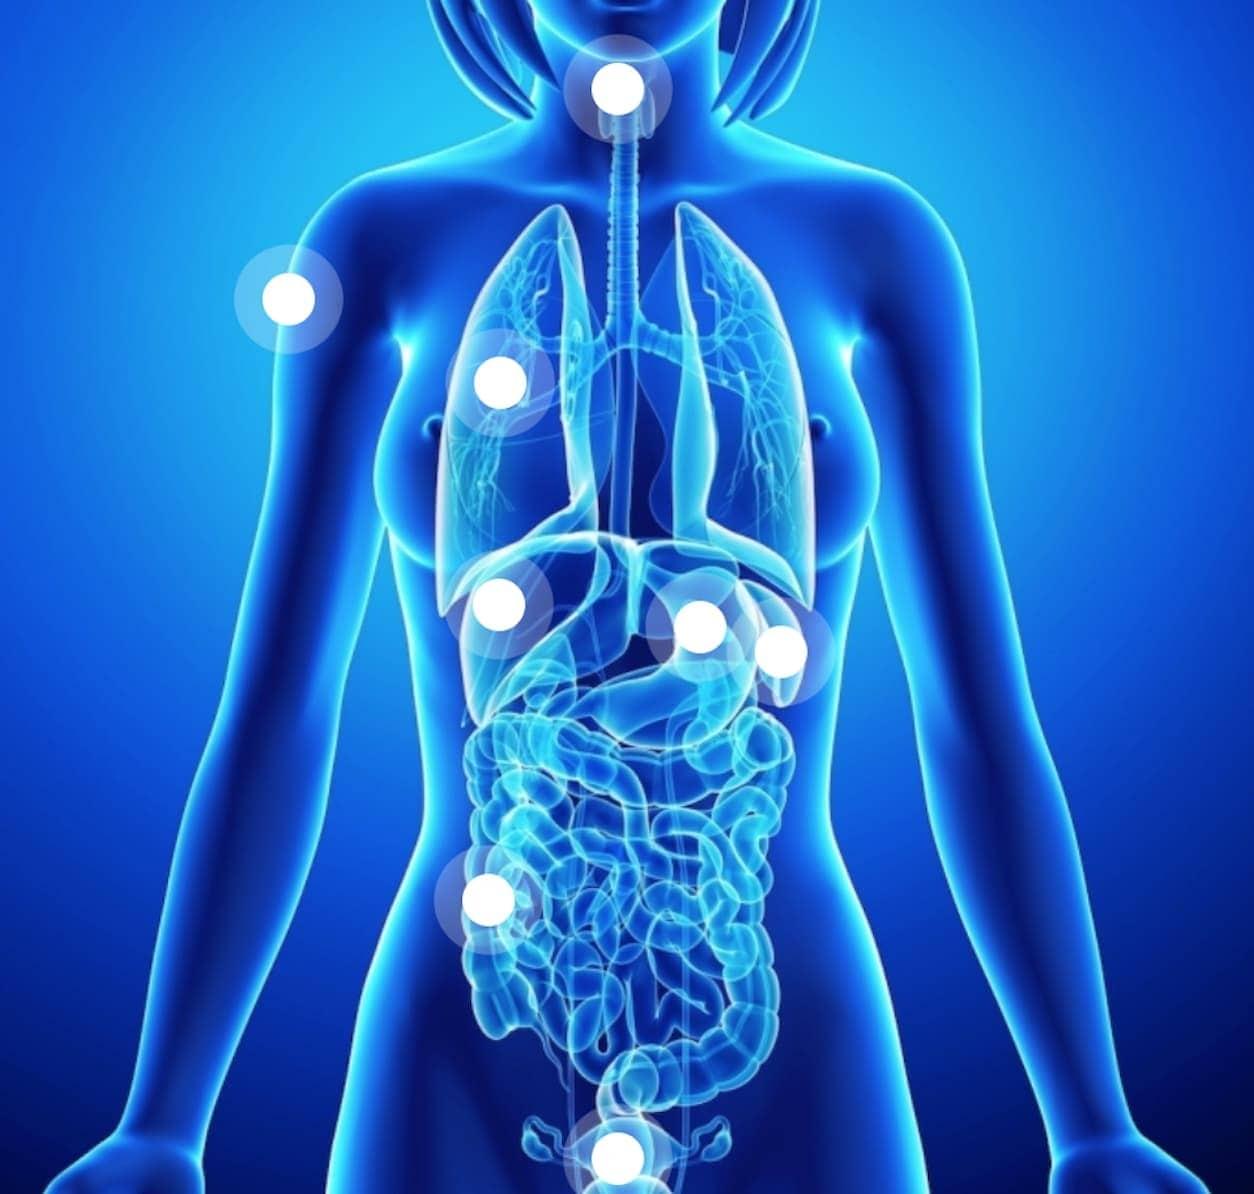 U.S. FDA approved immunecheckpoint inhibitors U.S. FDA approved immunotherapies for cancer U.S. FDA approved immunotherapies for cancer